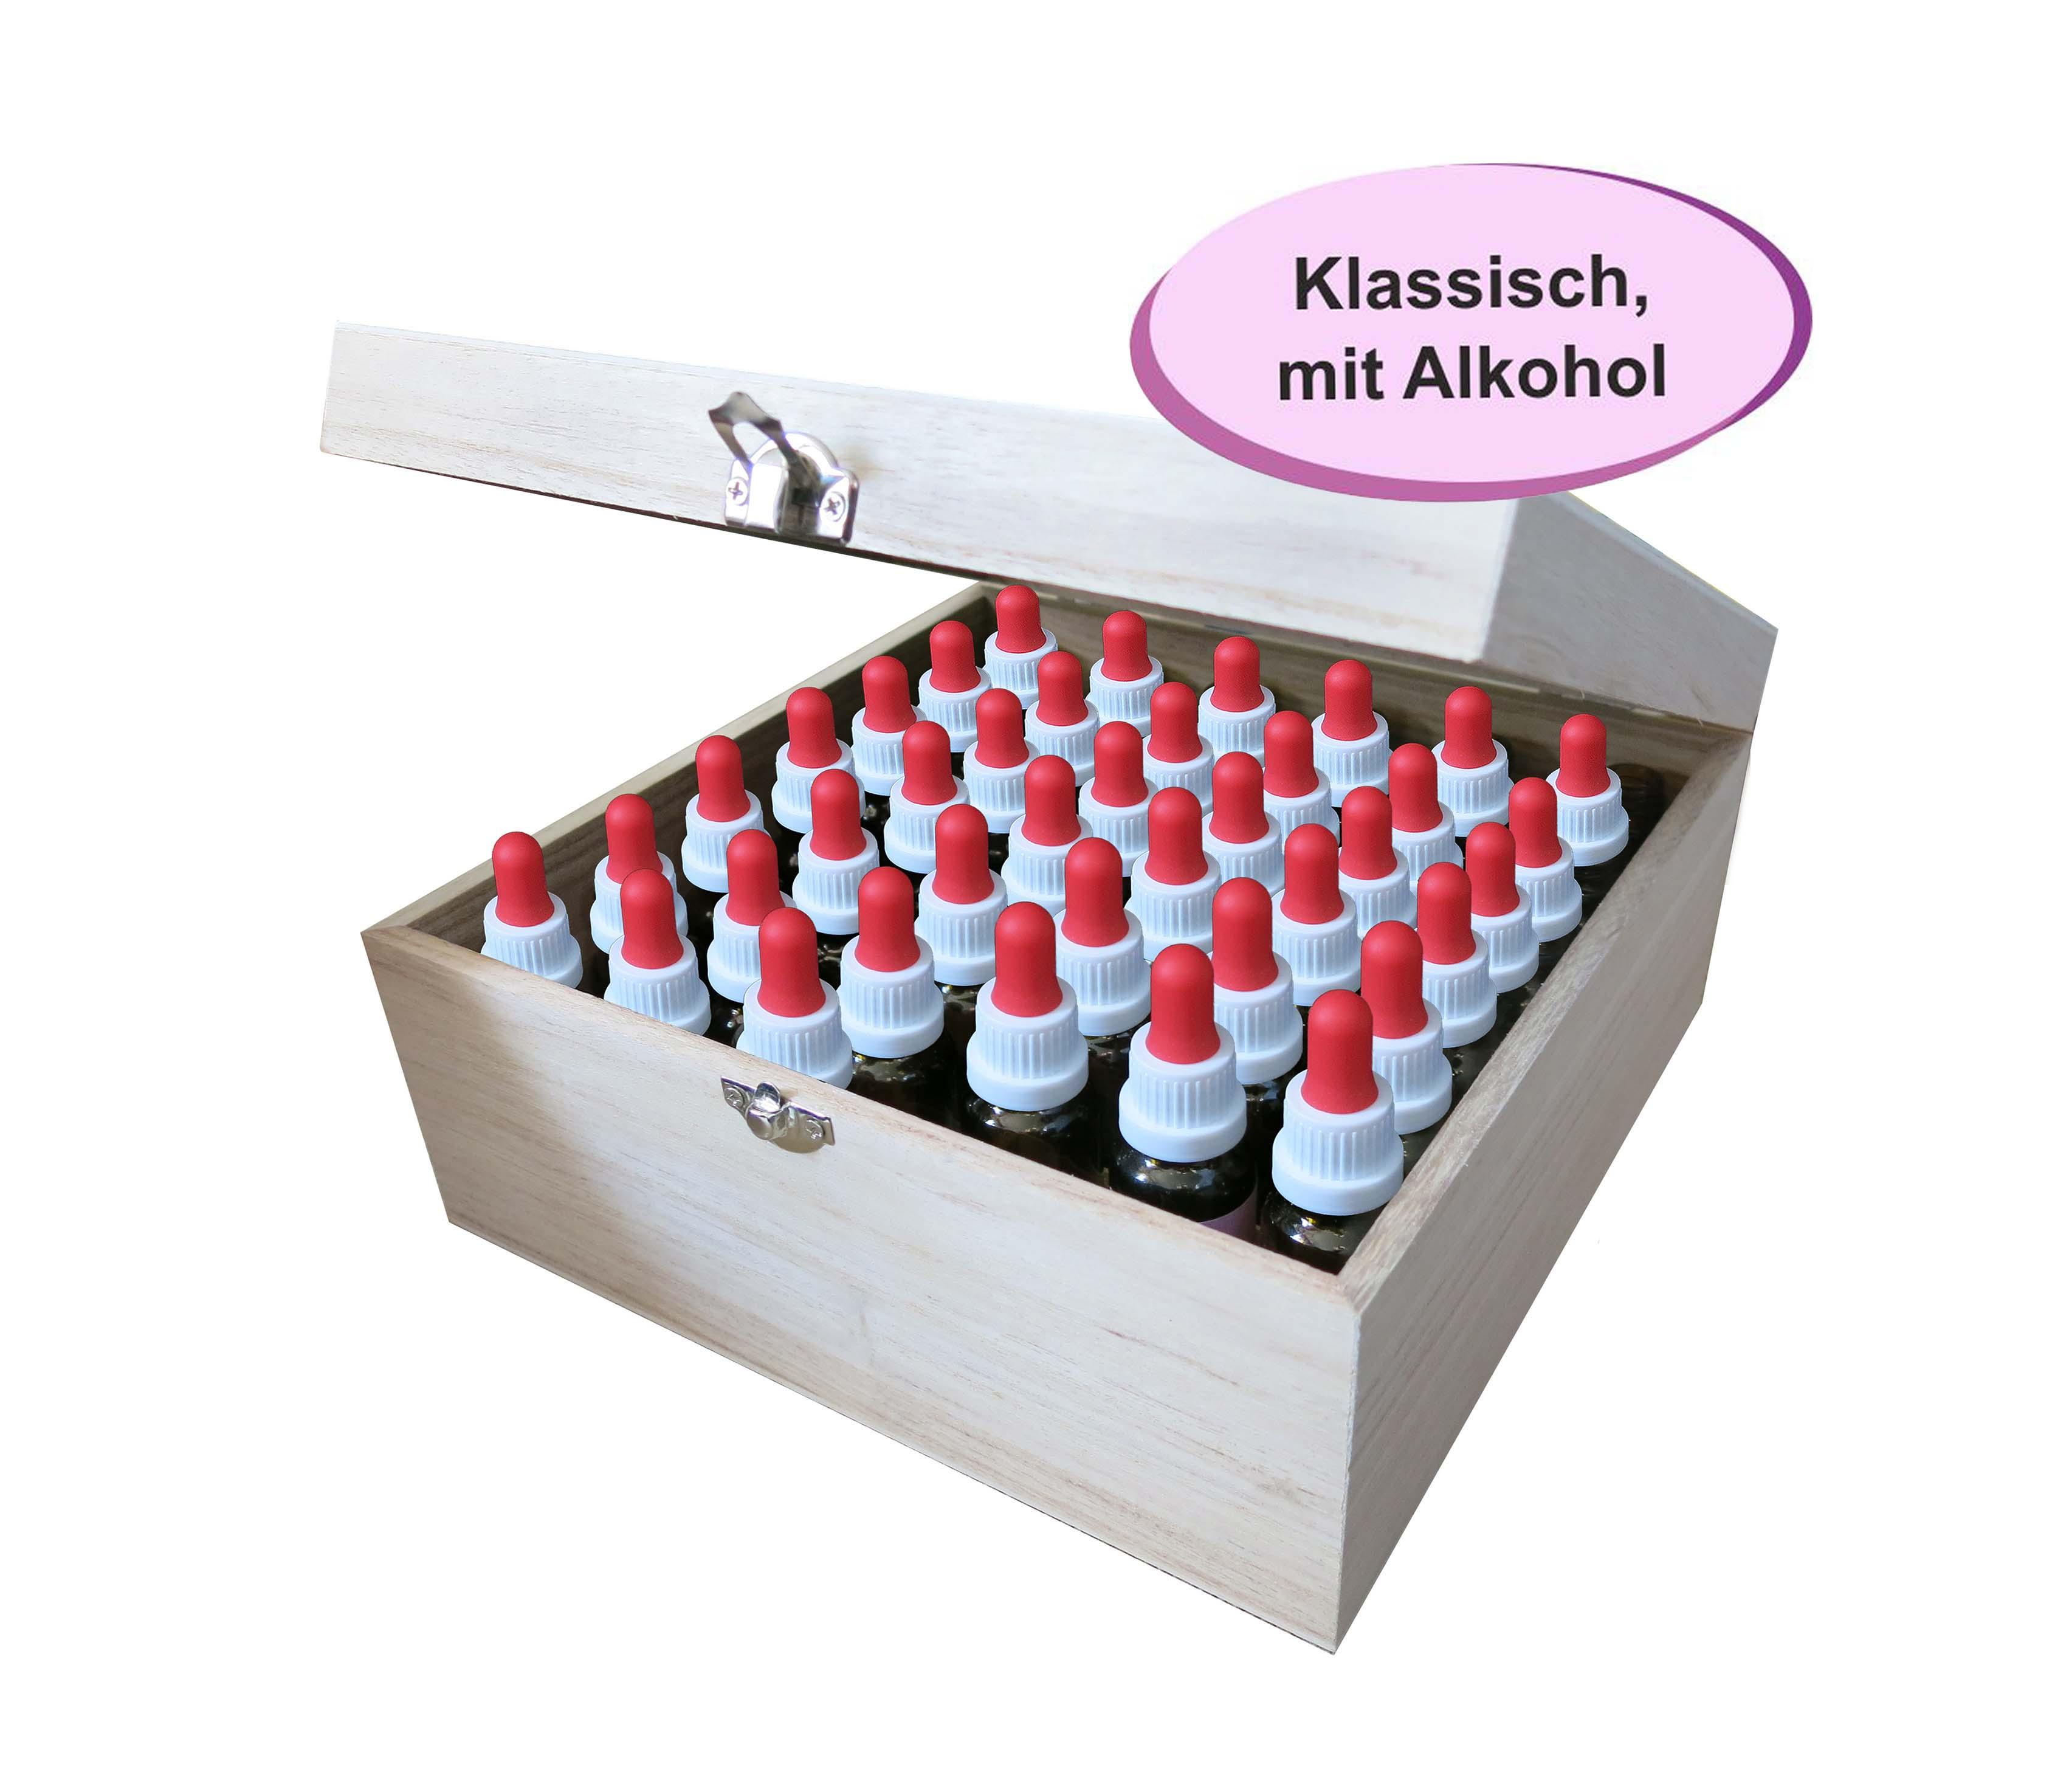 Bachblütenset 10 ml – klassisch mit Alkohol